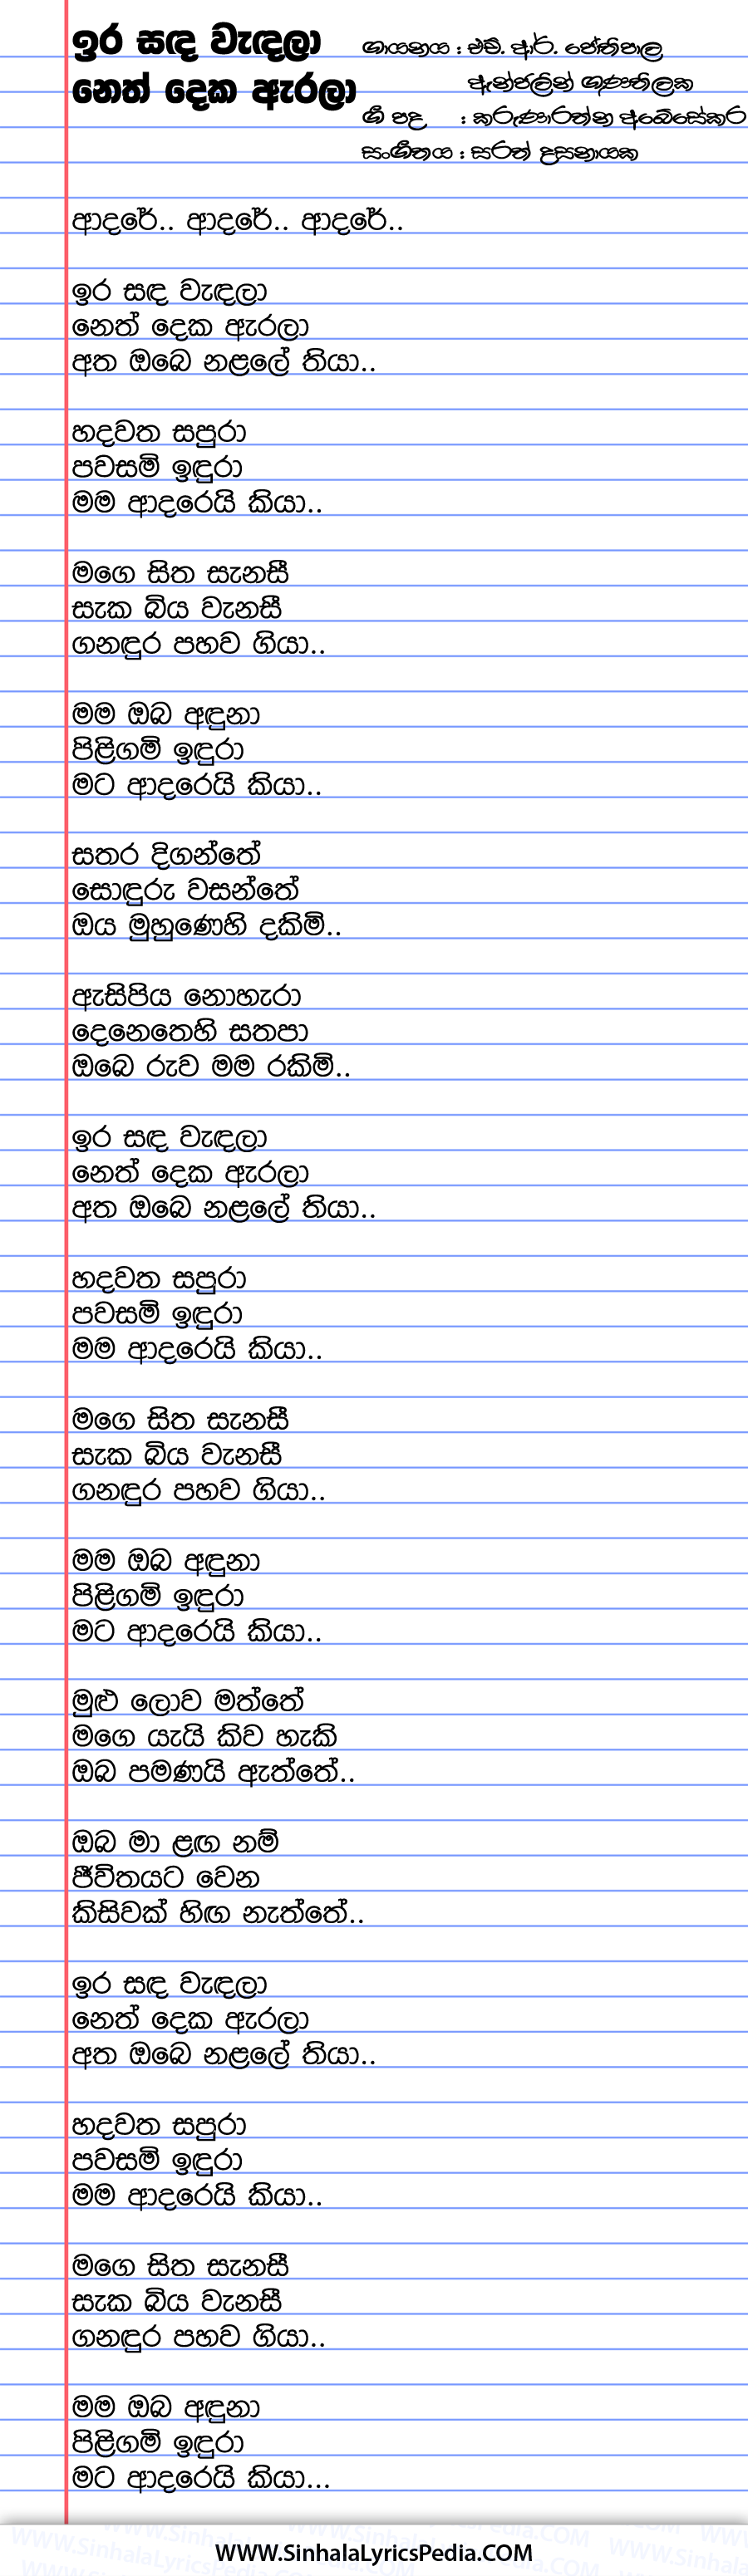 Ira Sanda Wandala Neth Deka Arala Song Lyrics